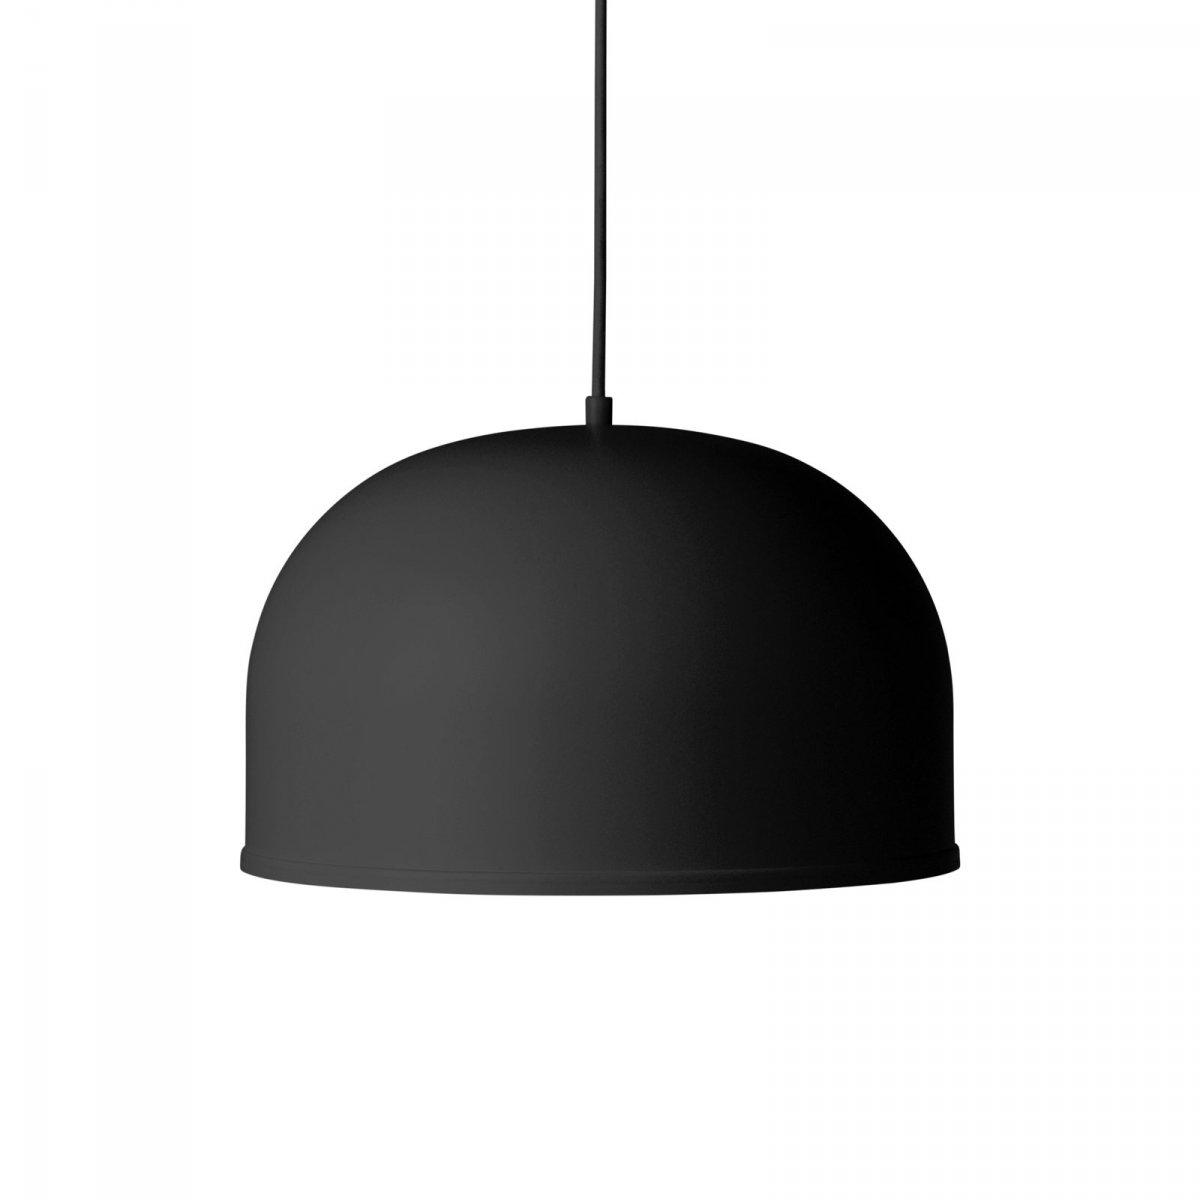 GM 30 Pendant, black.